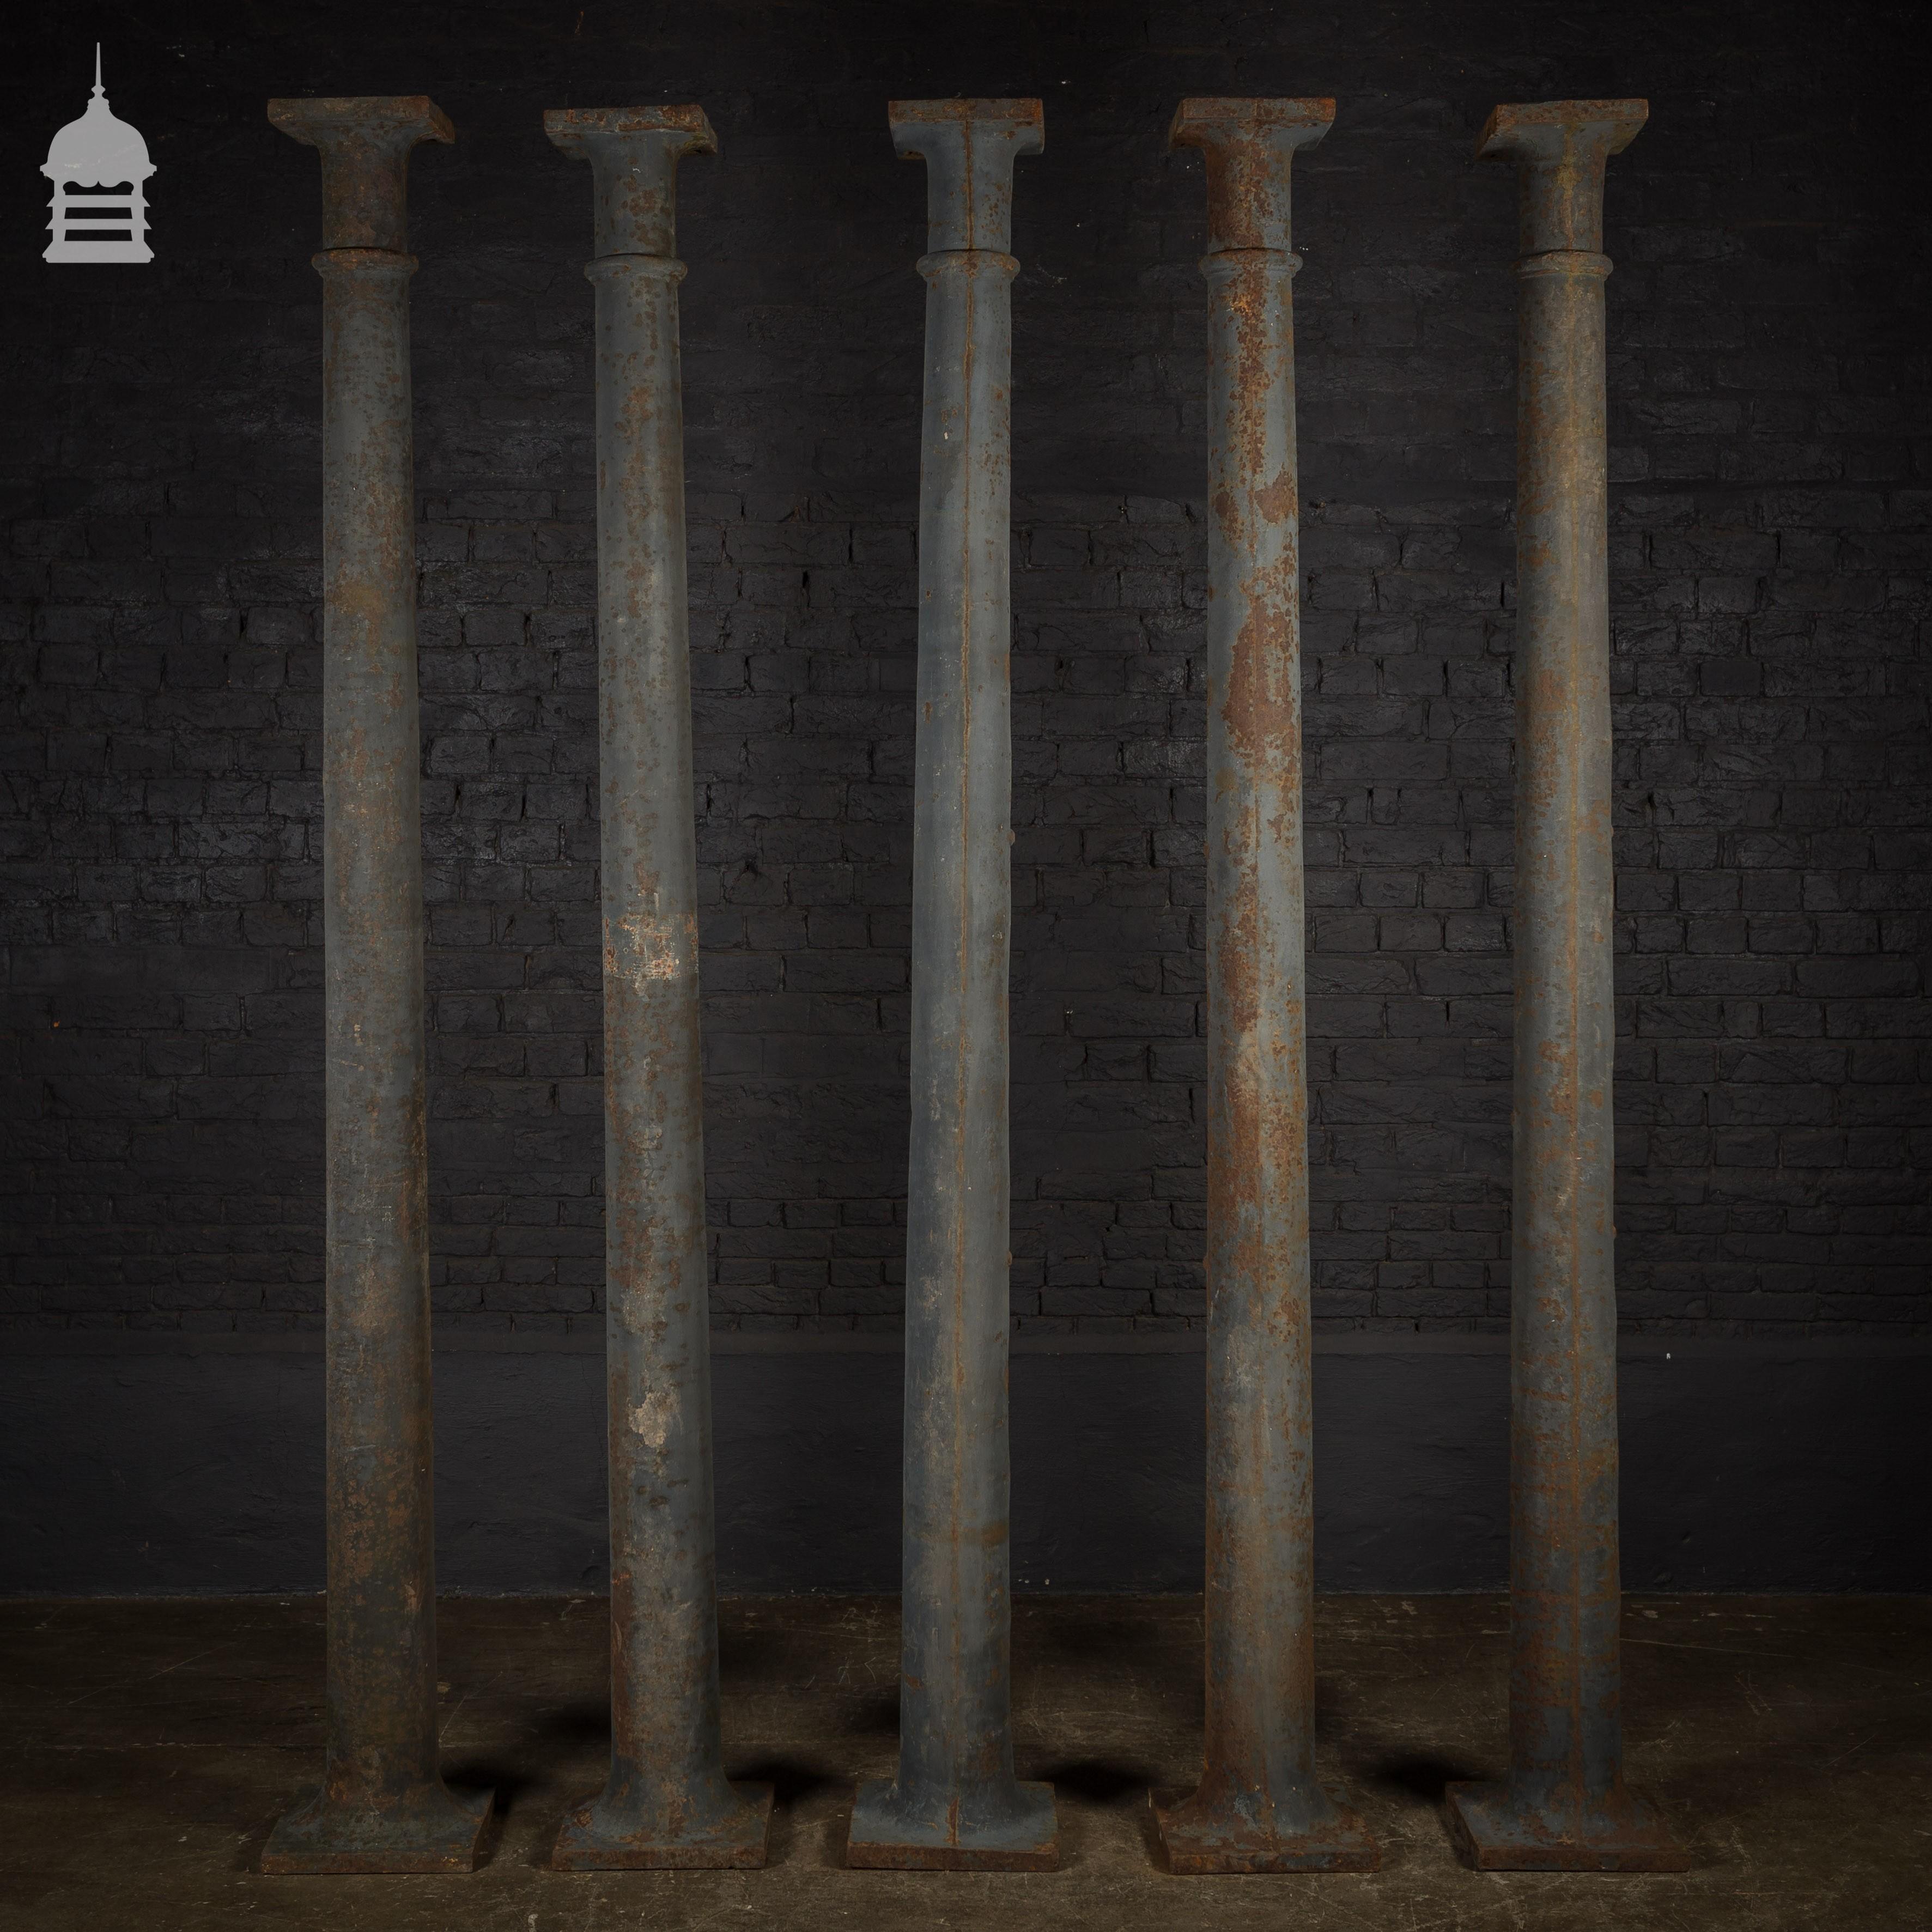 Set Of 5 19th C Industrial Cast Iron Columns Pillars Stanchions